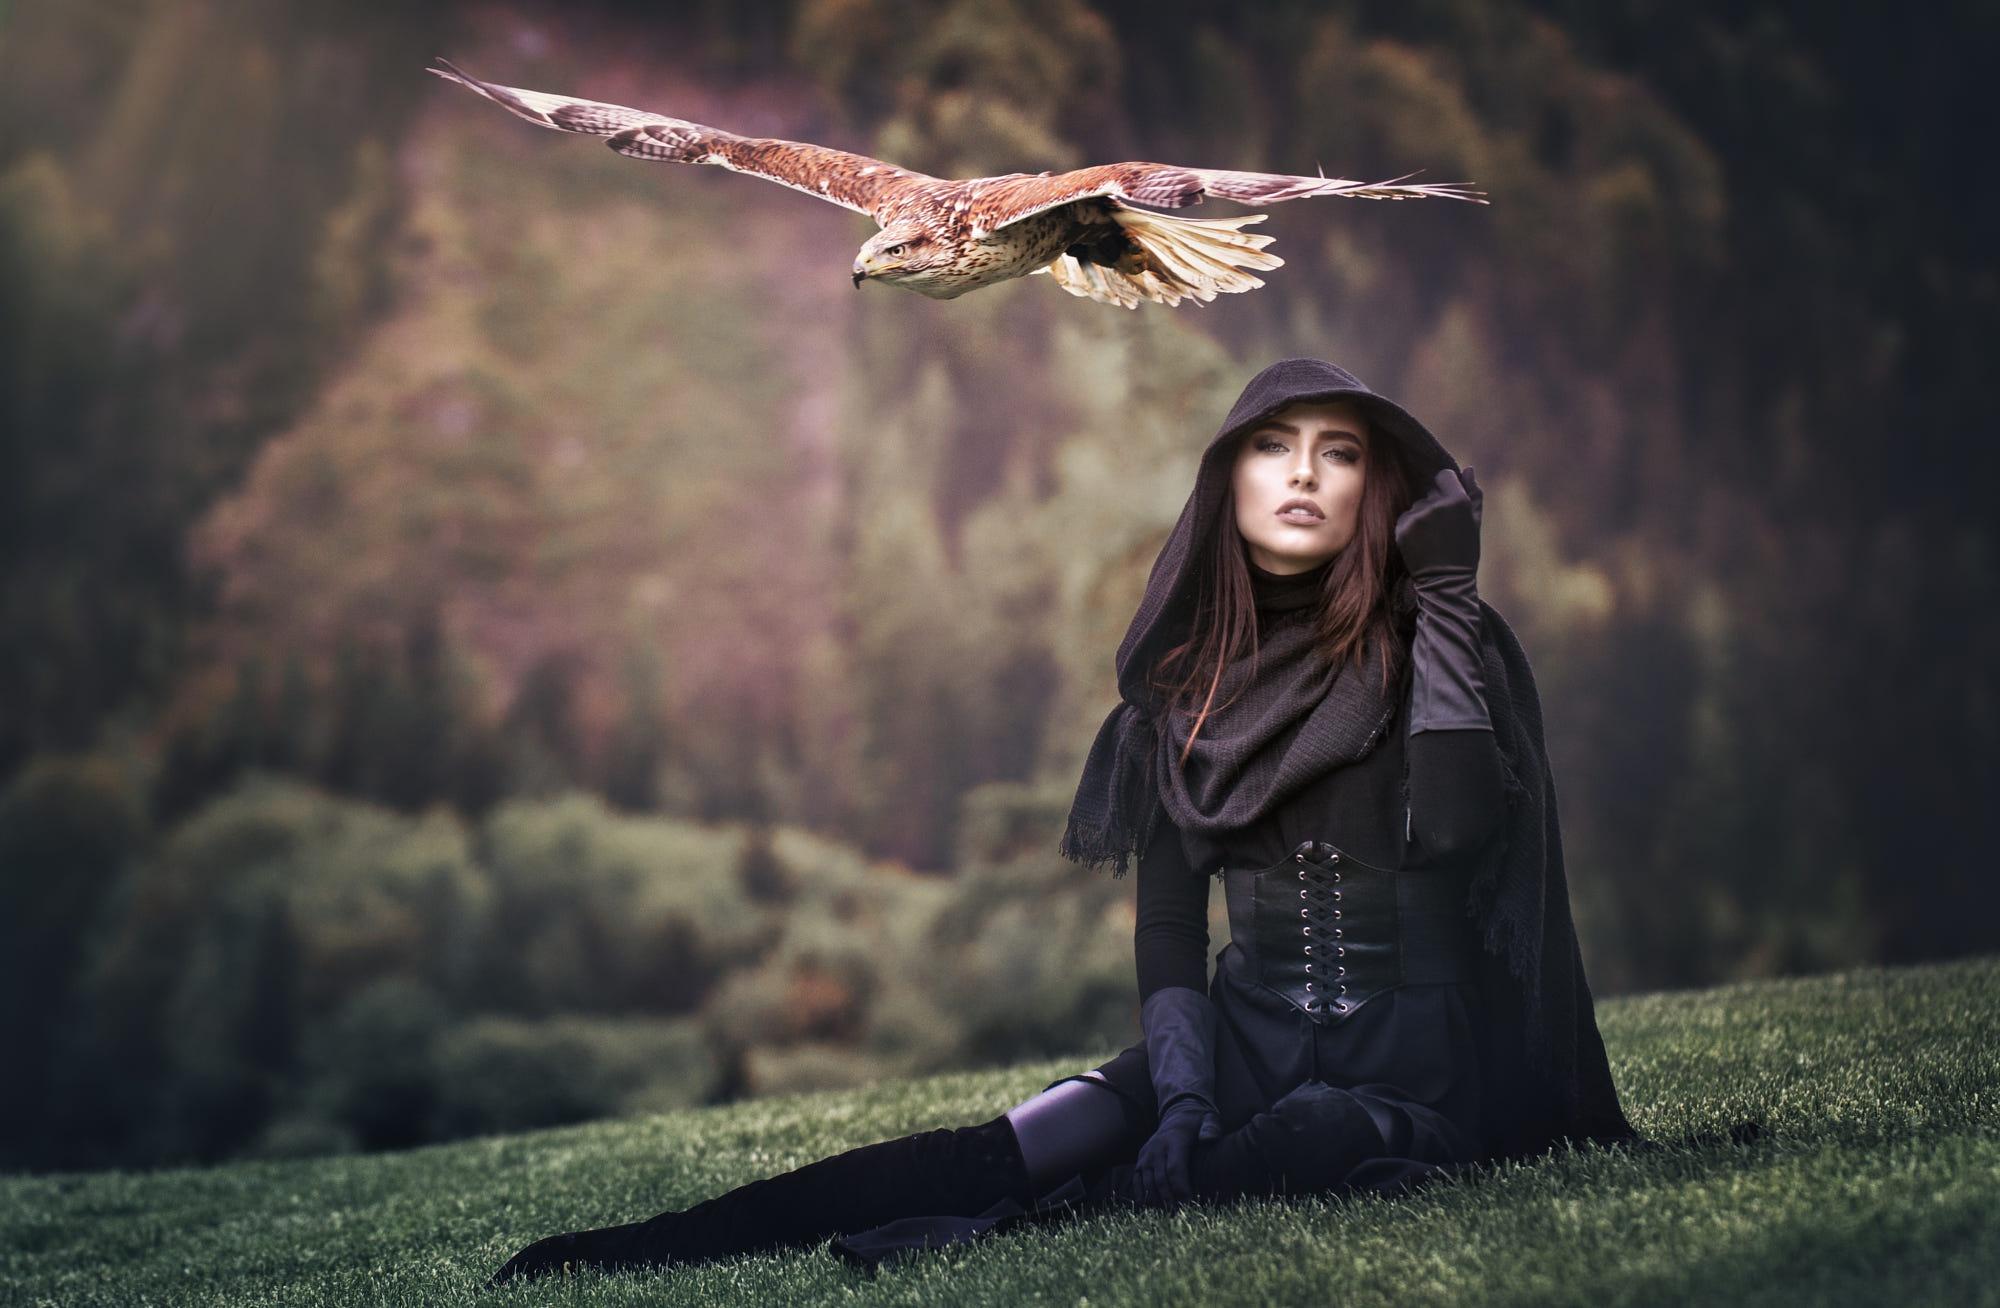 antique-picture-girl-gazing-bird